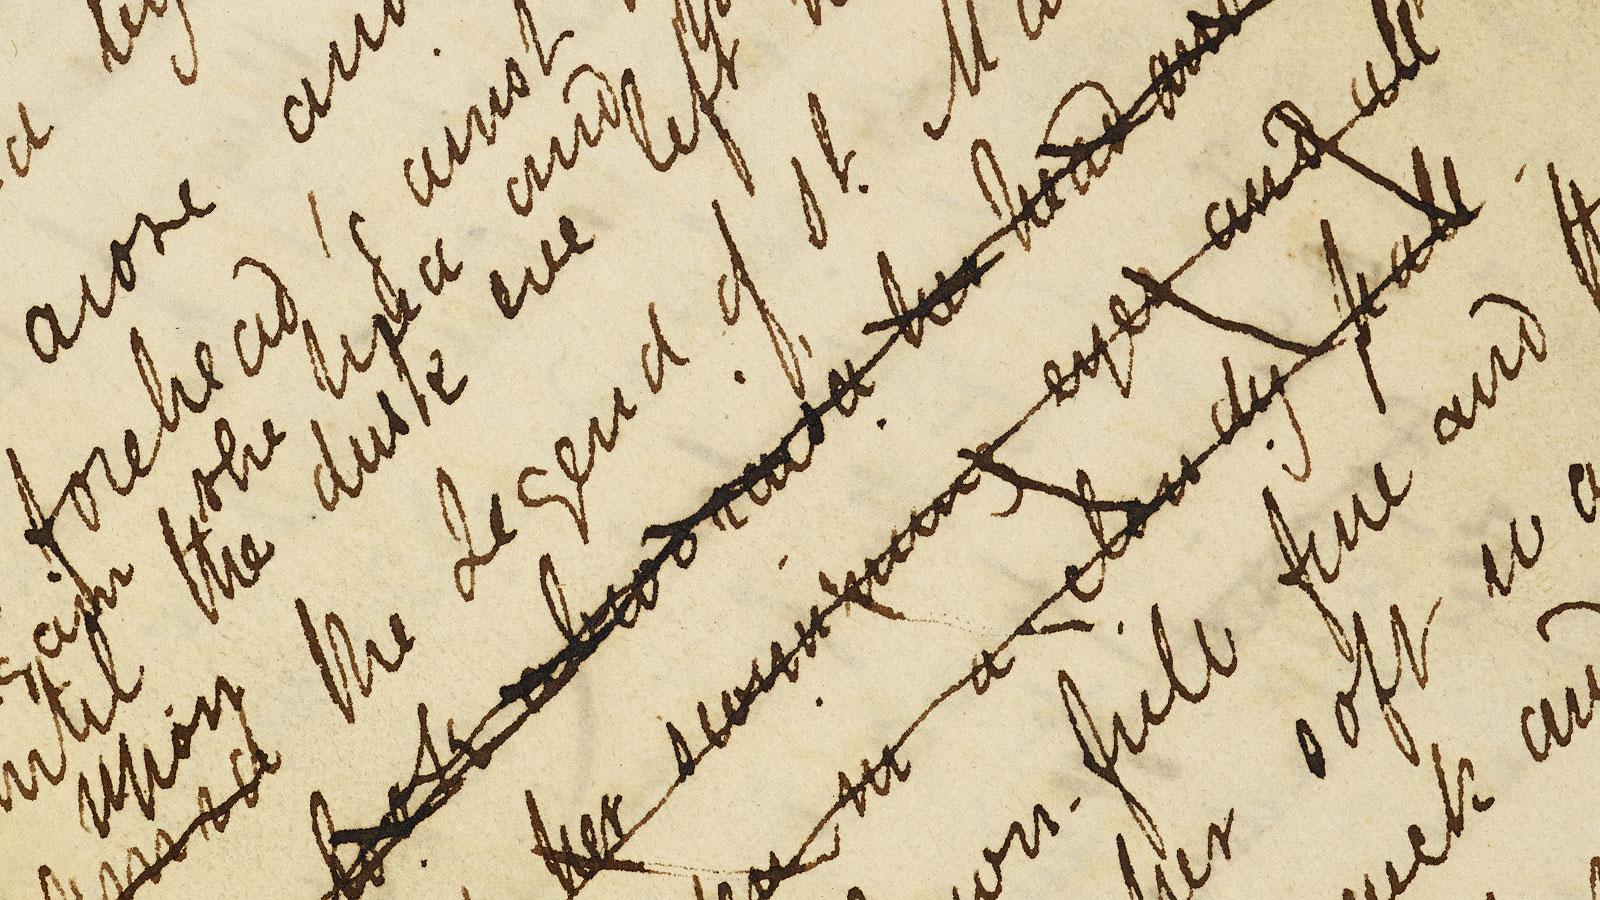 John Keats, Poet-Physician